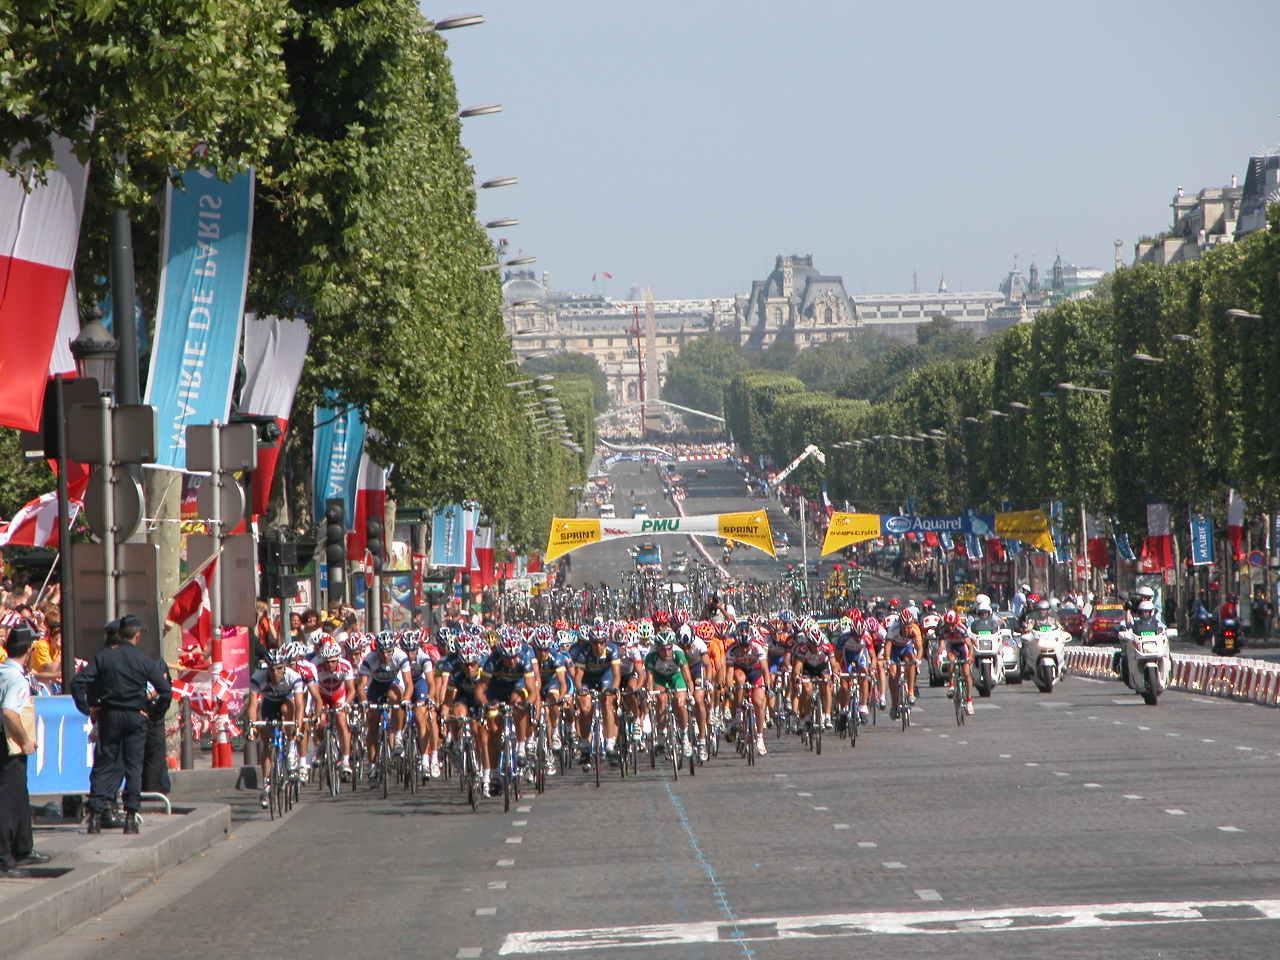 Champs de elysee David Ward 2004 Tour DSCN0035-1